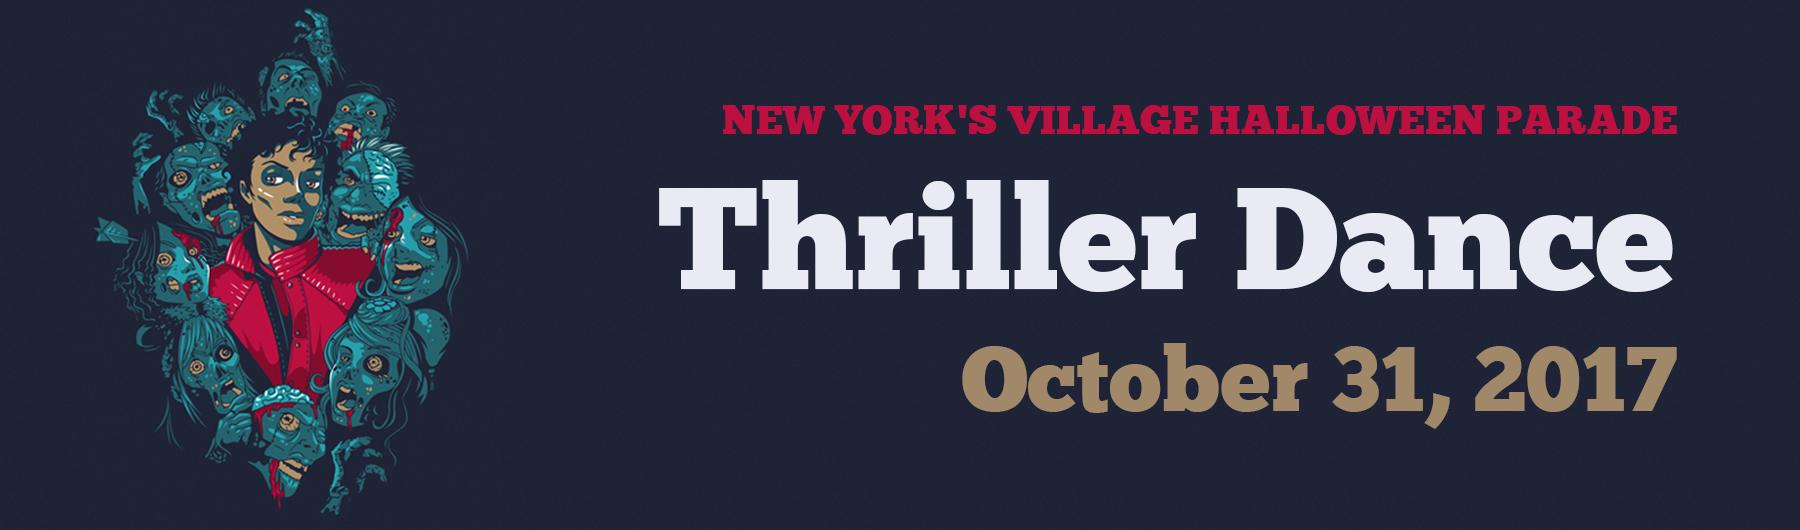 Thriller Dance at the Village Halloween Parade